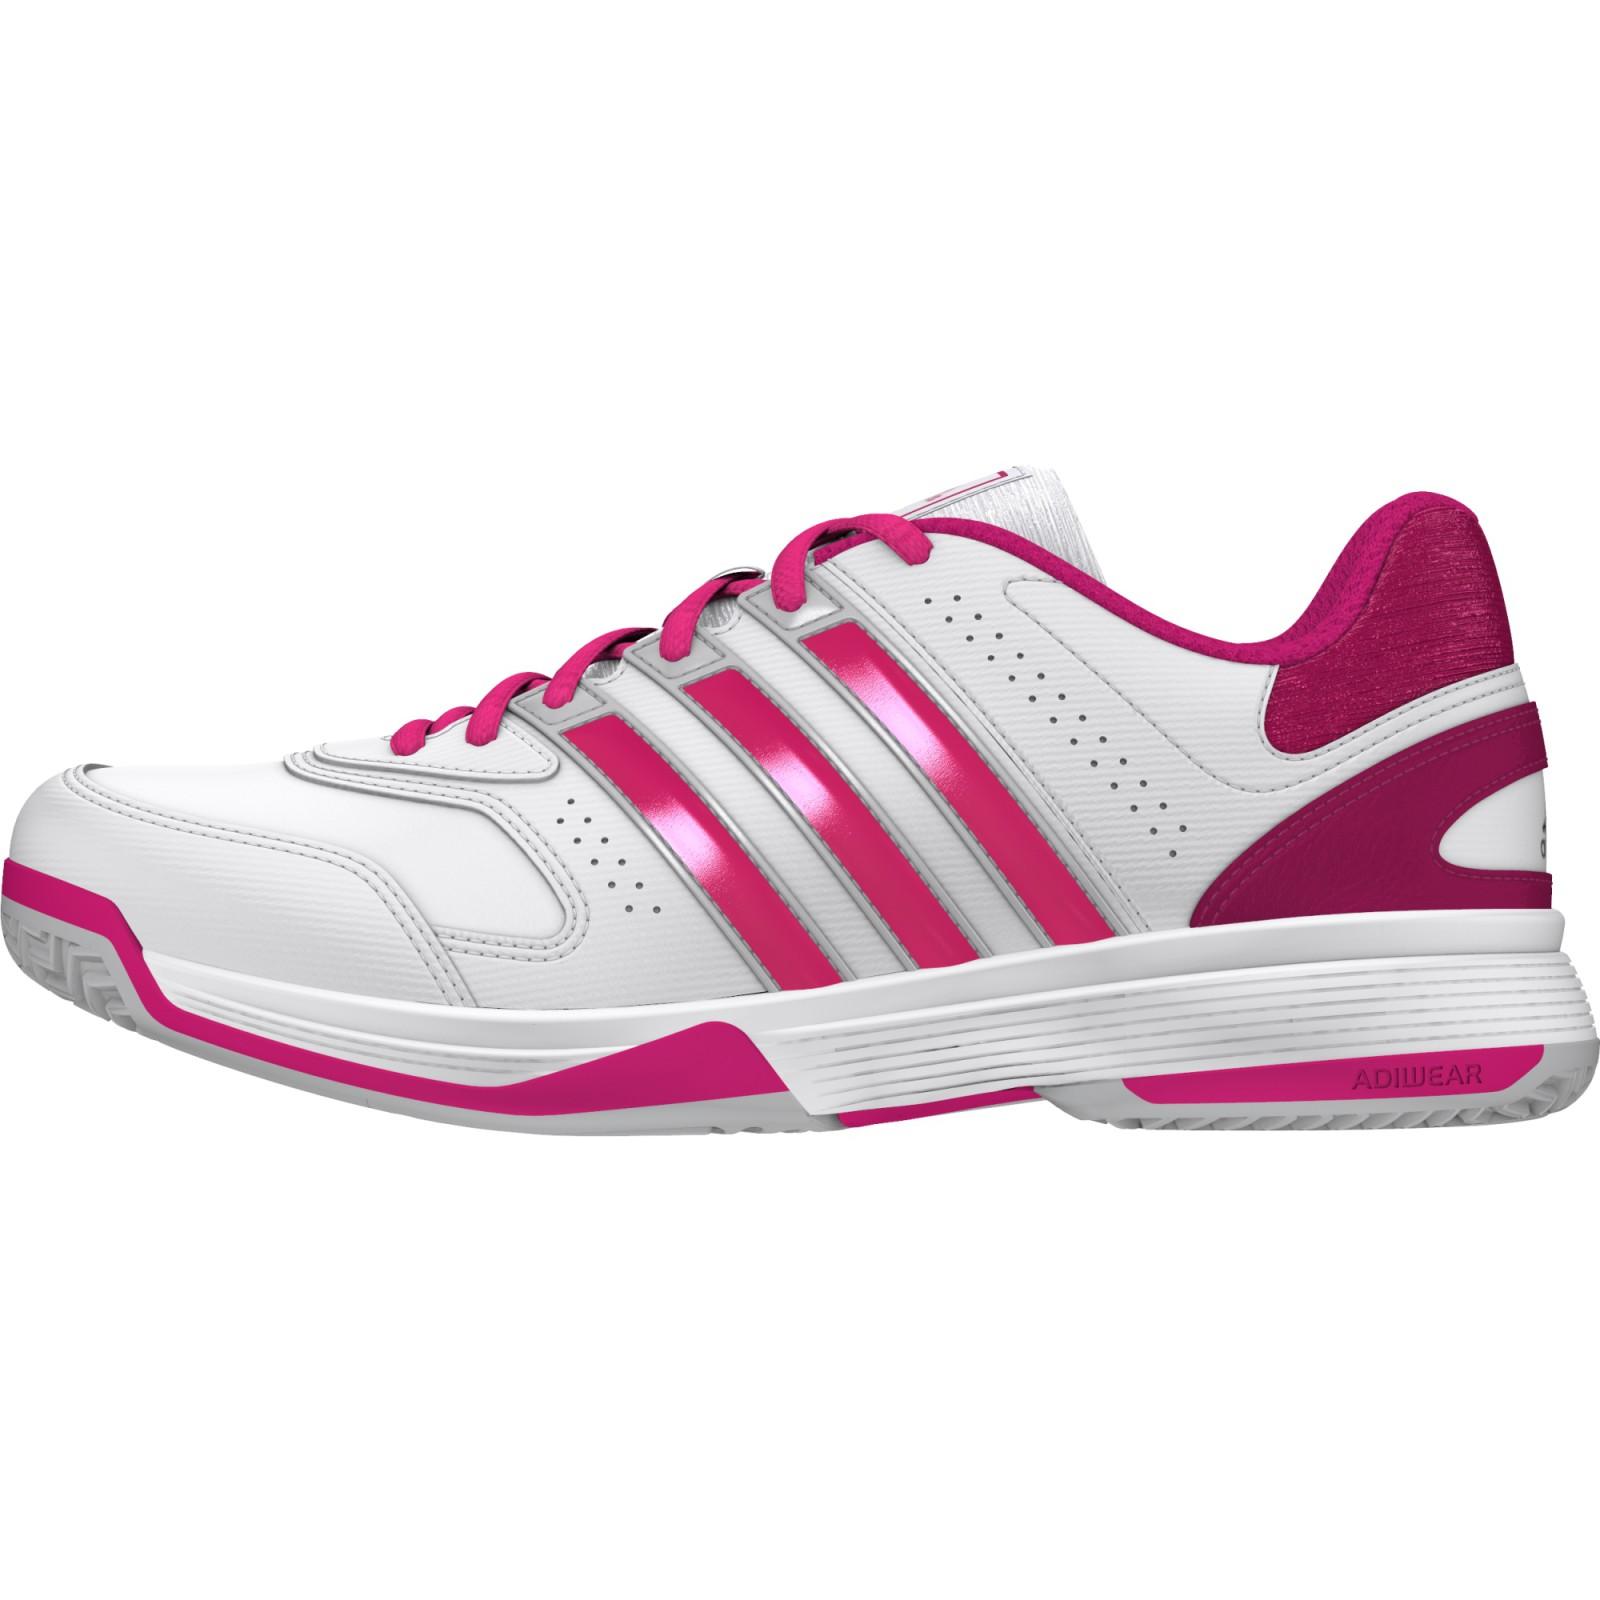 296e10e8ed5 Dámské tenisové boty adidas response aspire STR w